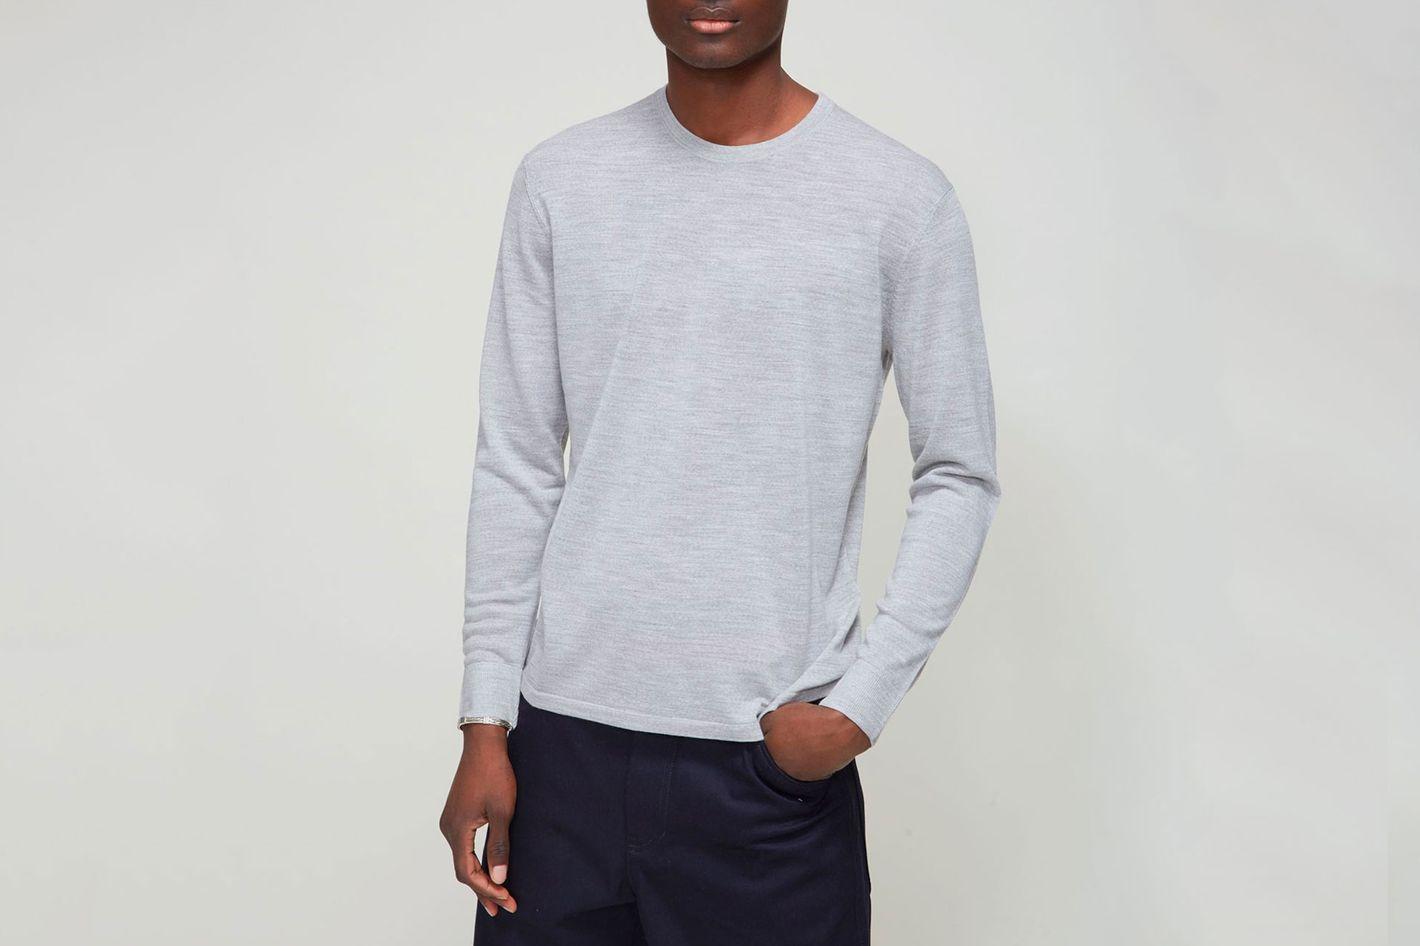 Acne Studios Nipo Crew Sweater